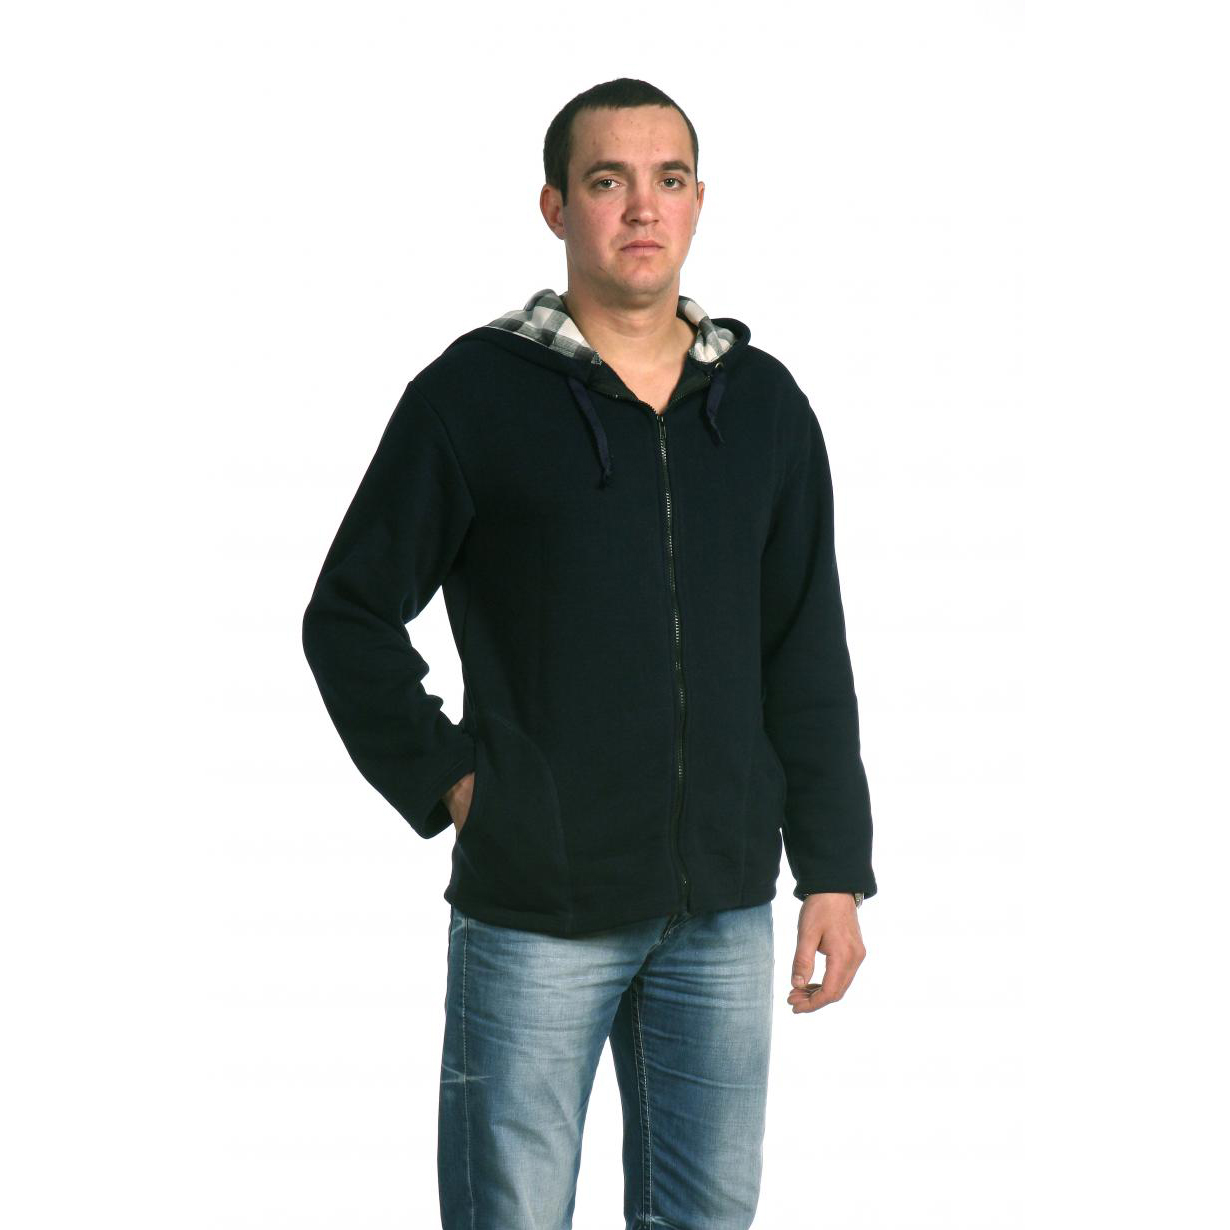 Мужская толстовка «Денвер», размер 52Толстовки, джемпера и рубашки<br>Обхват груди:104 см<br>Обхват талии:96 см<br>Обхват бедер:108 см<br>Рост:176-182 см<br><br>Тип: Муж. толстовка<br>Размер: 52<br>Материал: Футер